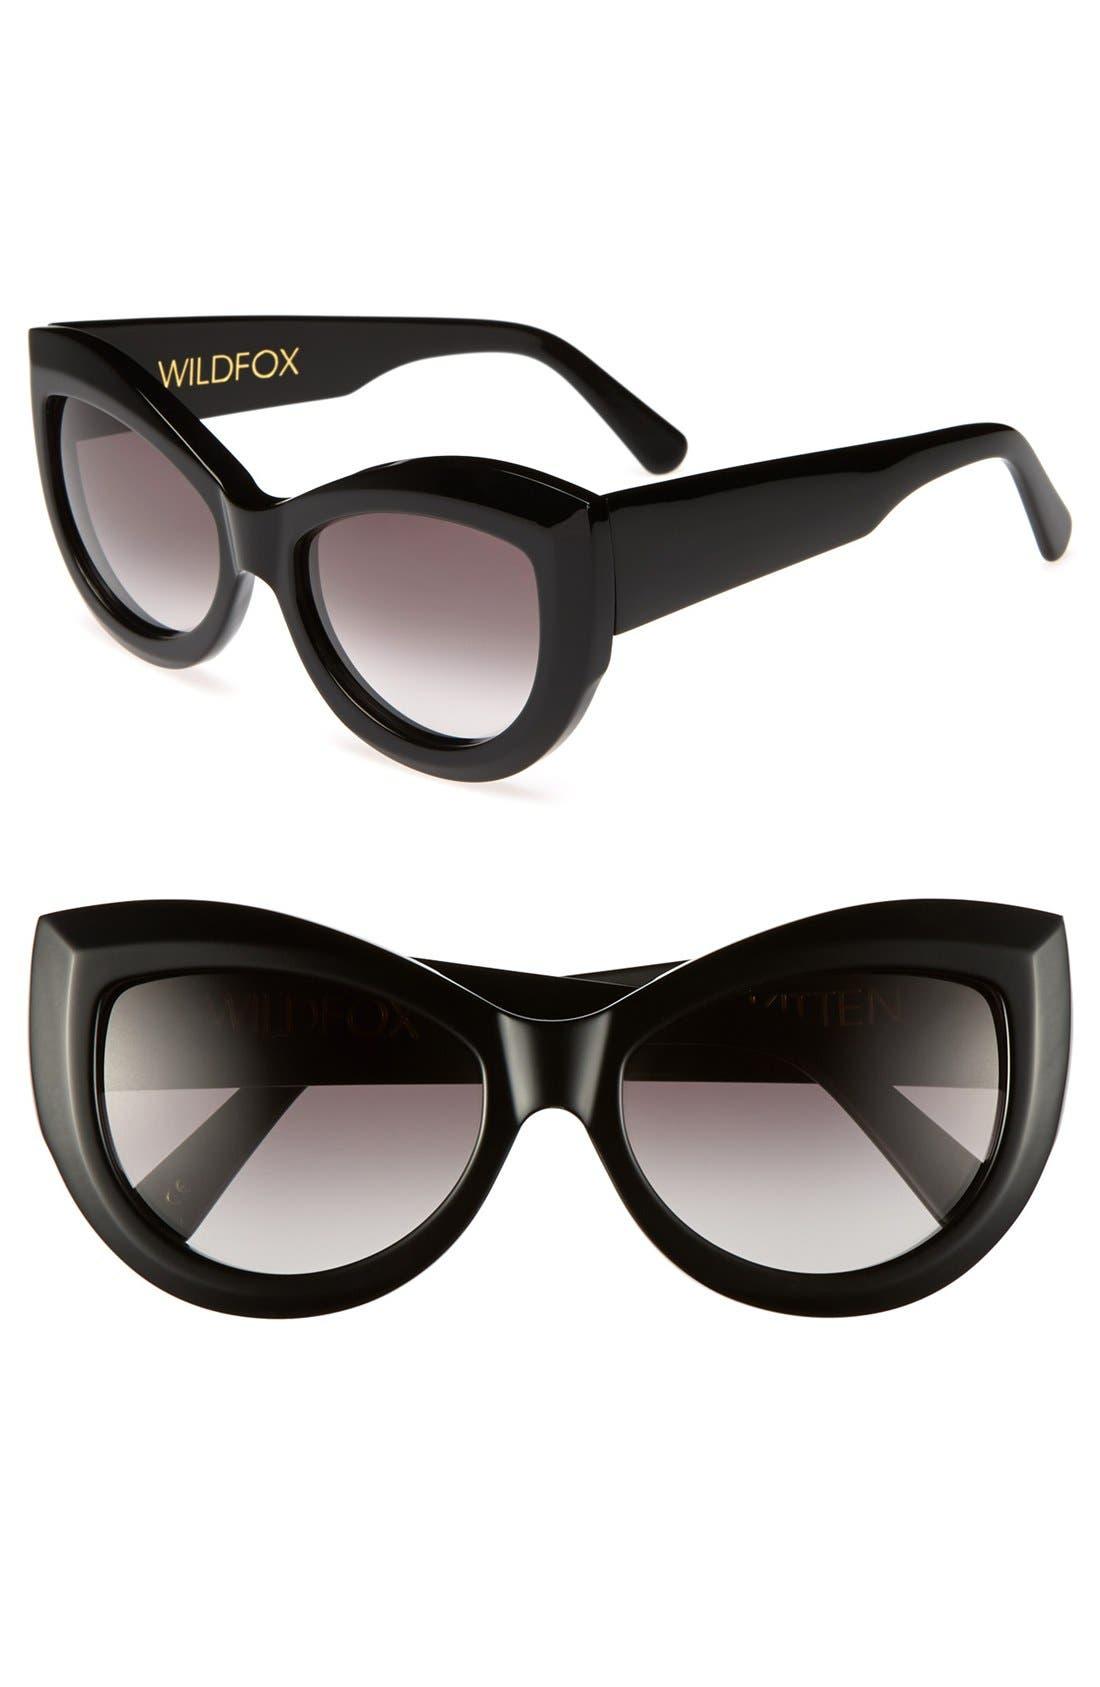 WILDFOX 'Kitten' 56mm Sunglasses, Main, color, 001